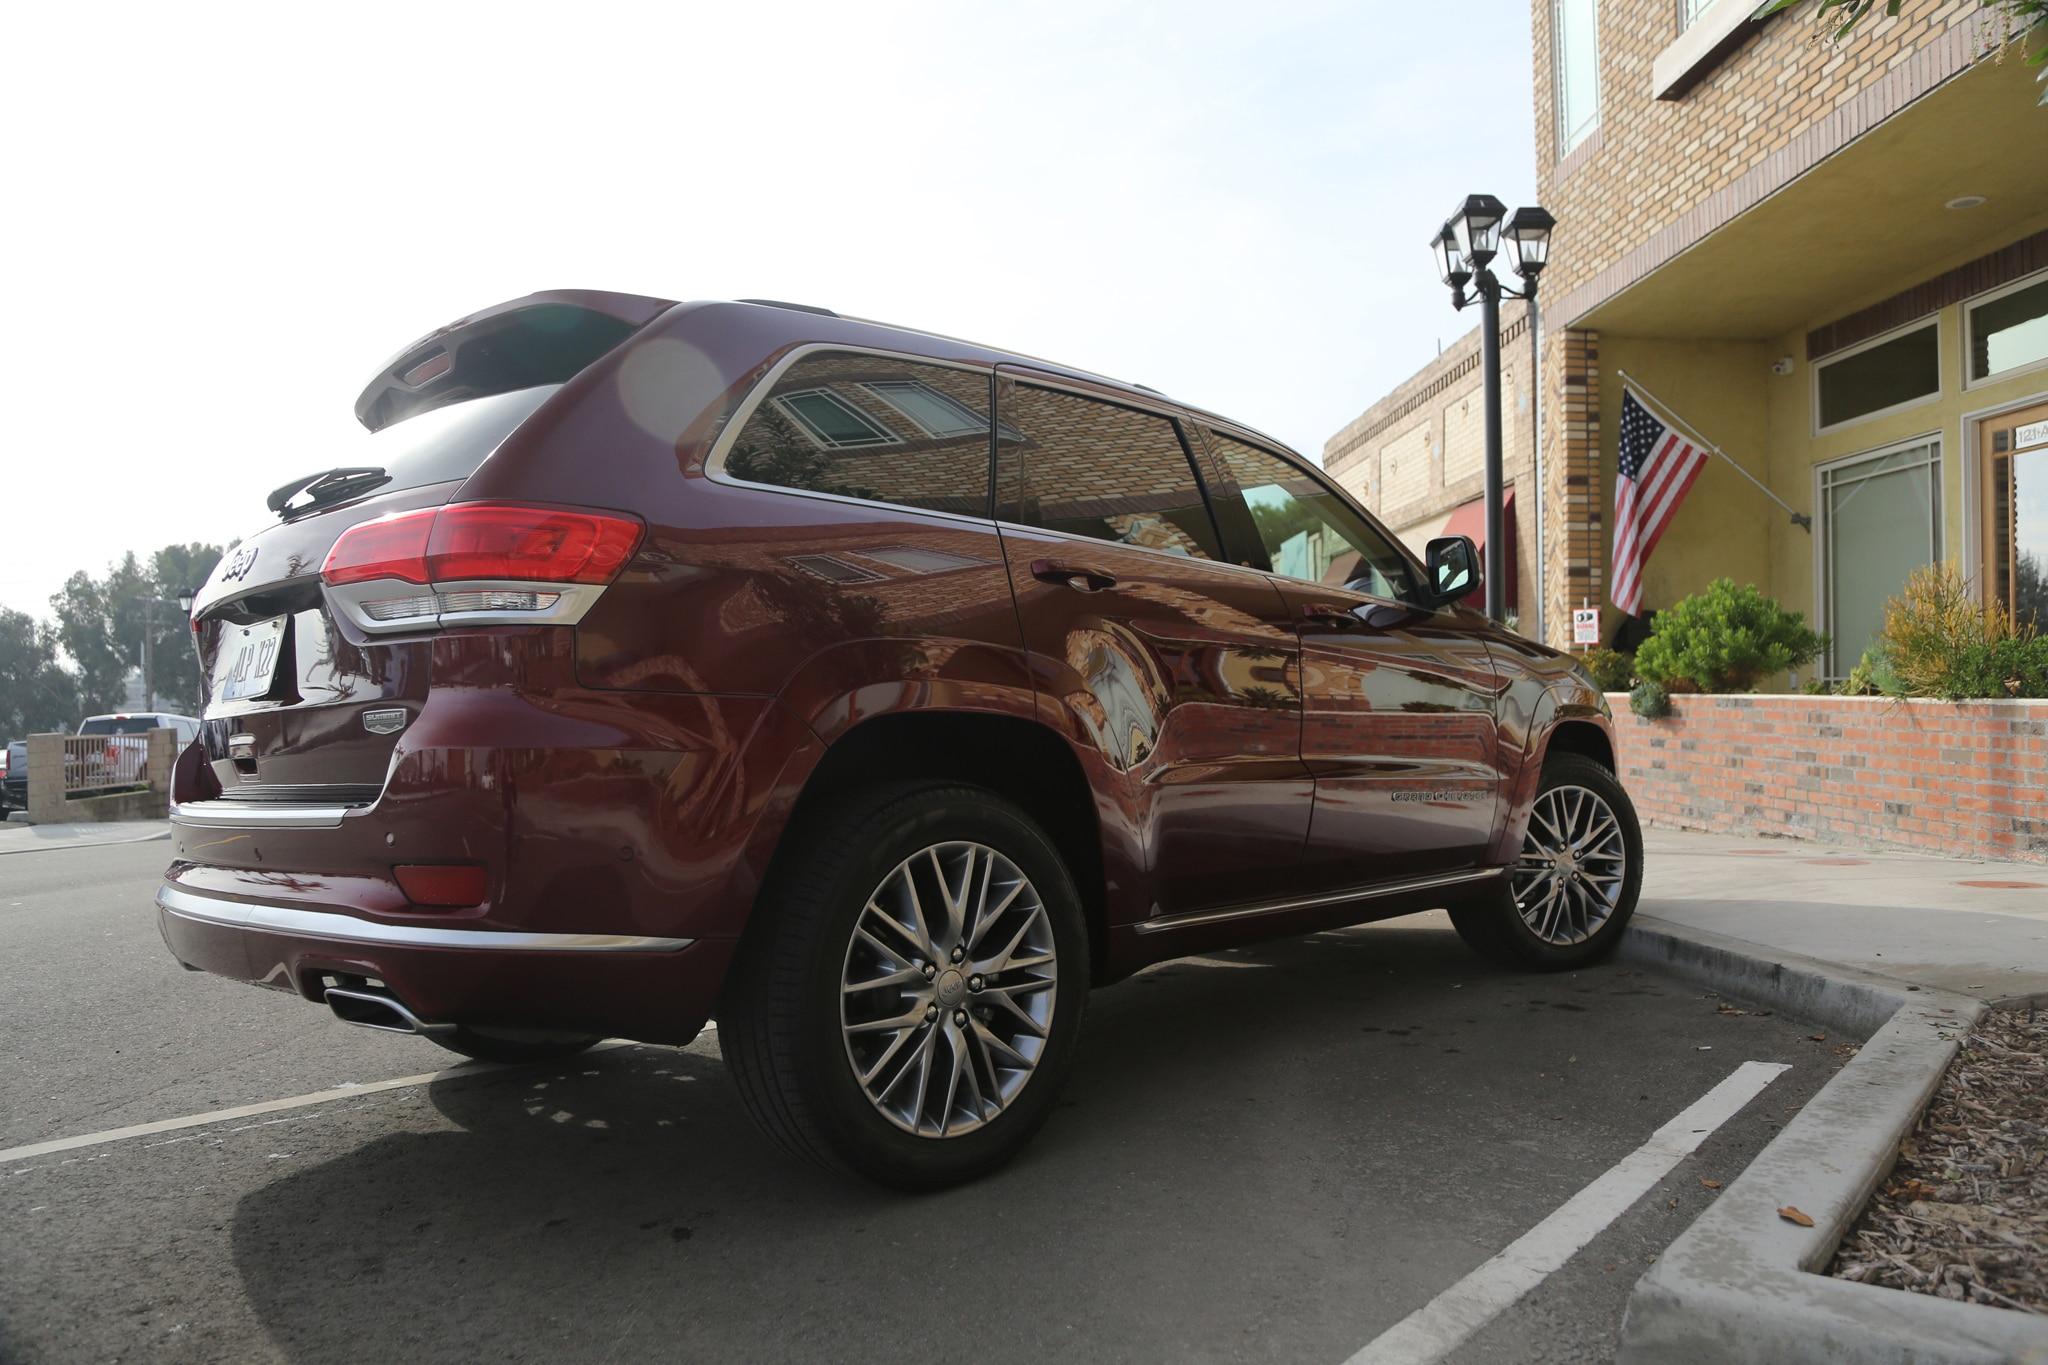 2017 Jeep Grand Cherokee Rear Three Quarter 01